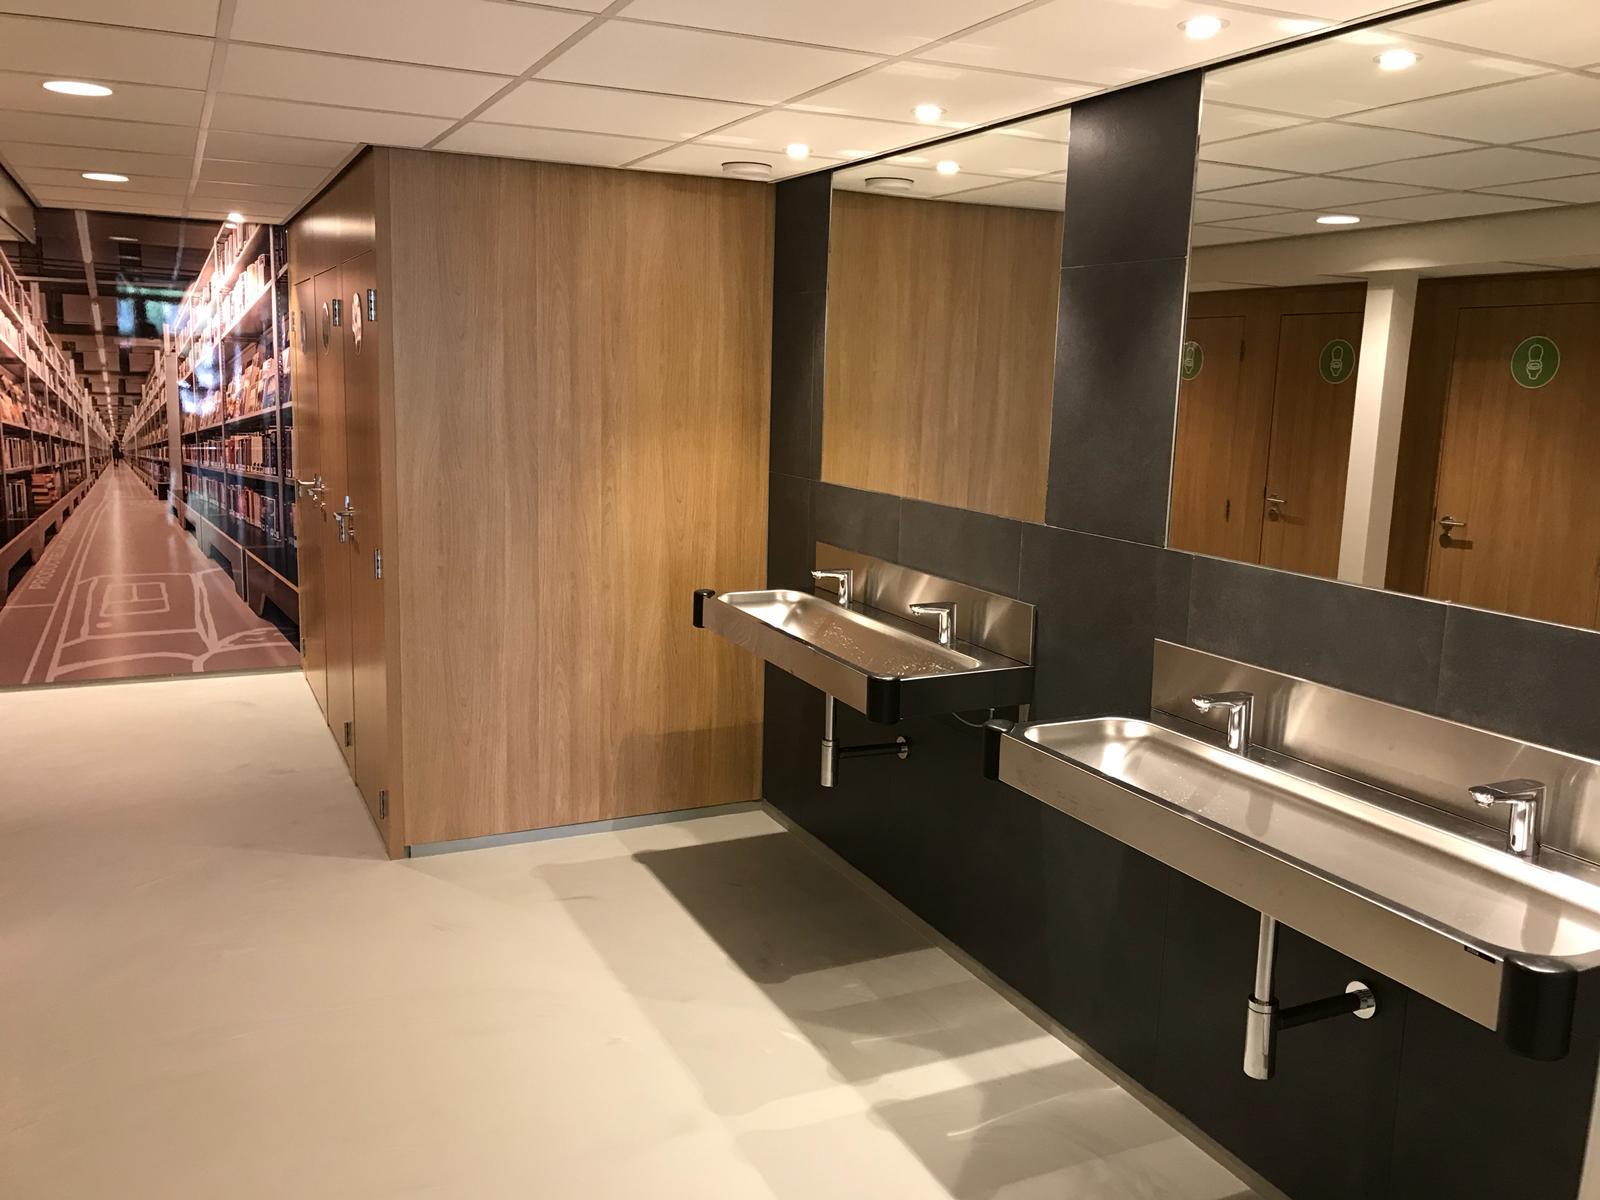 Toletto - Publieke toiletten Chocoladefabriek Gouda 1